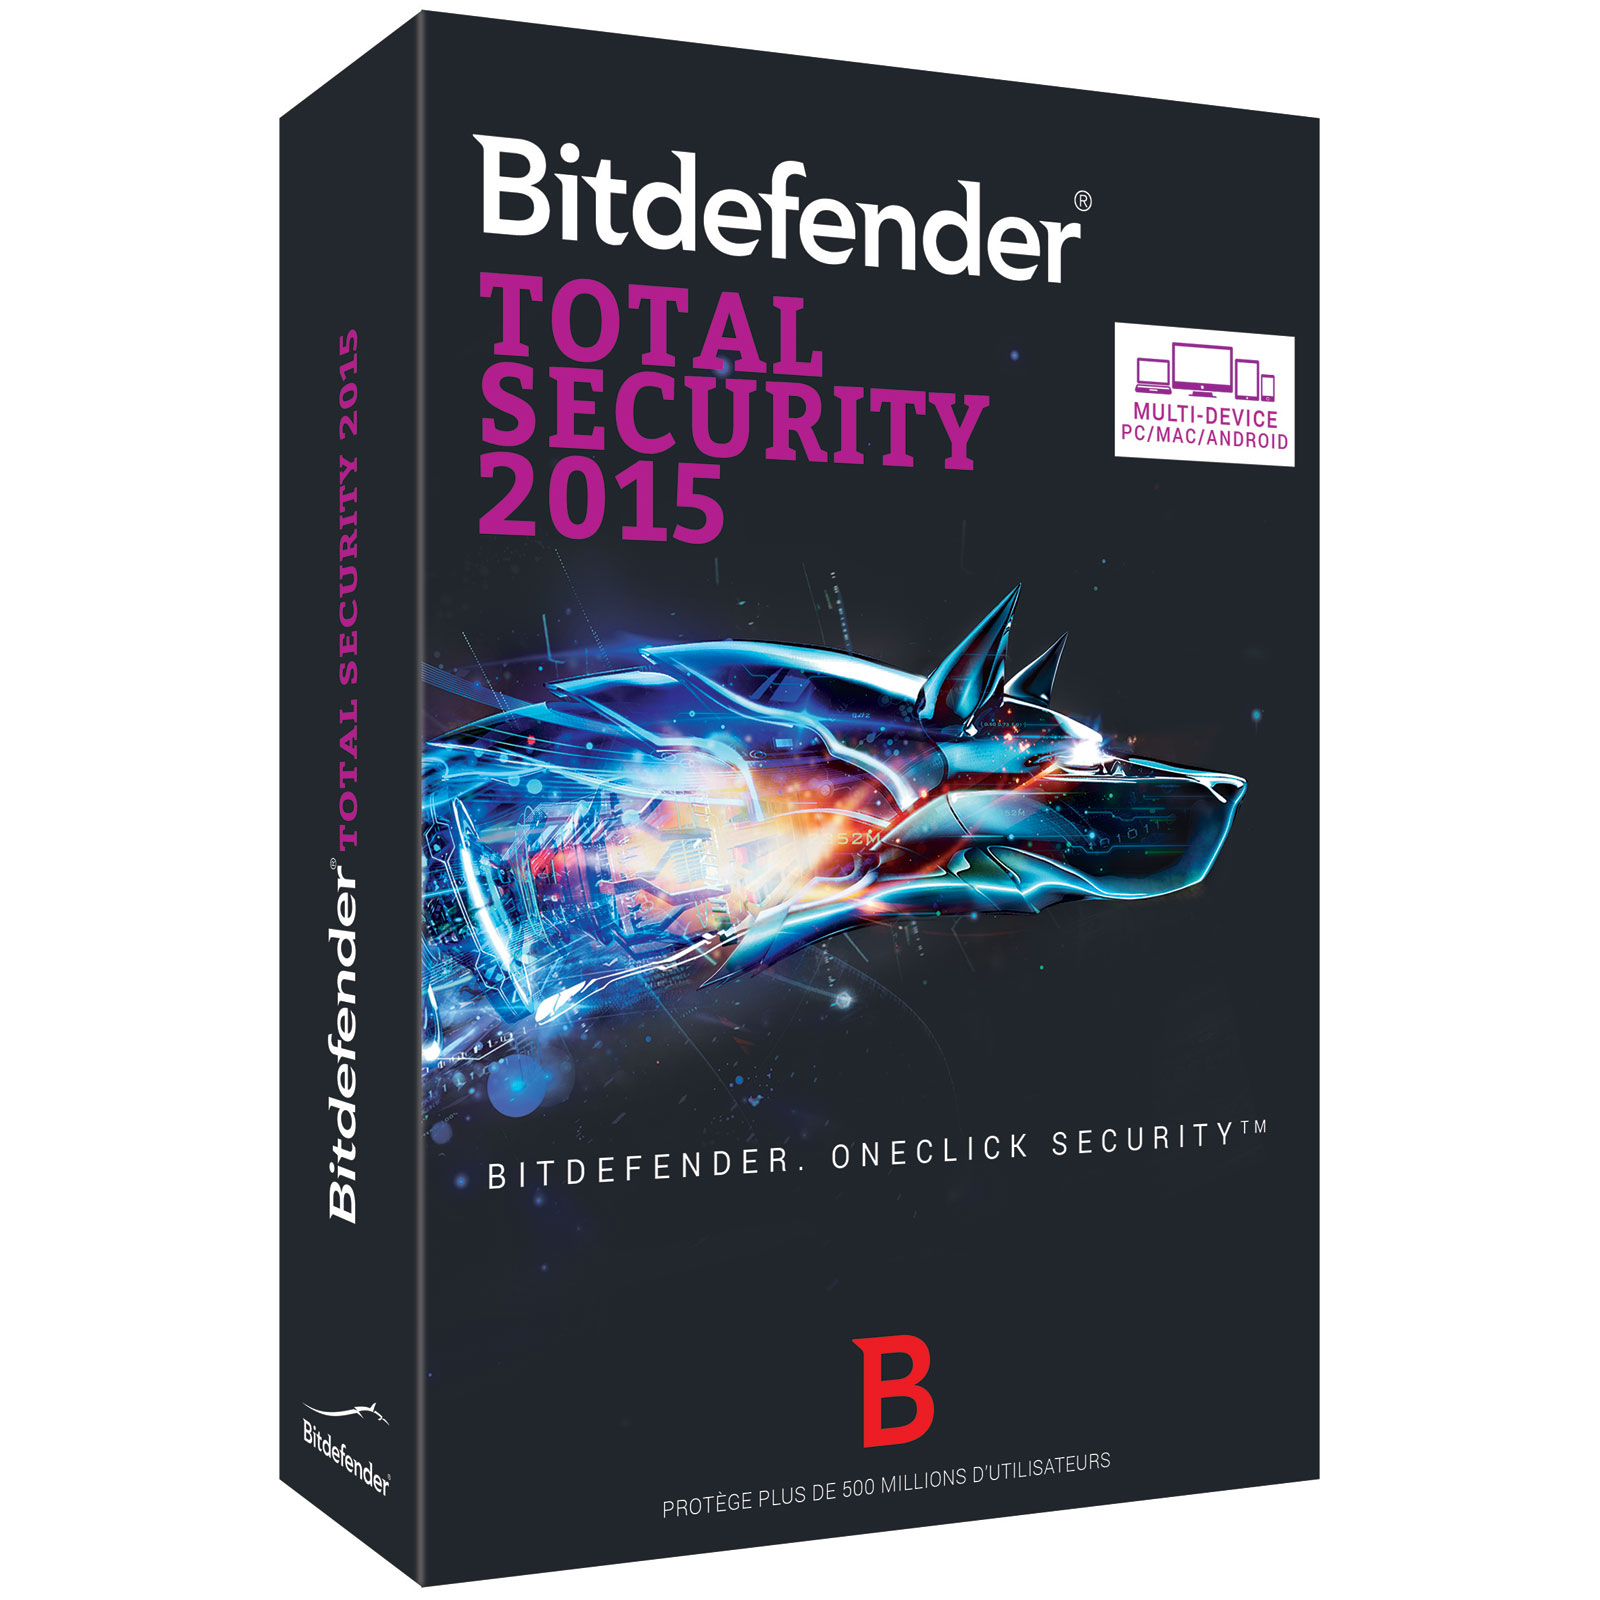 bitdefender 2015 license key generator